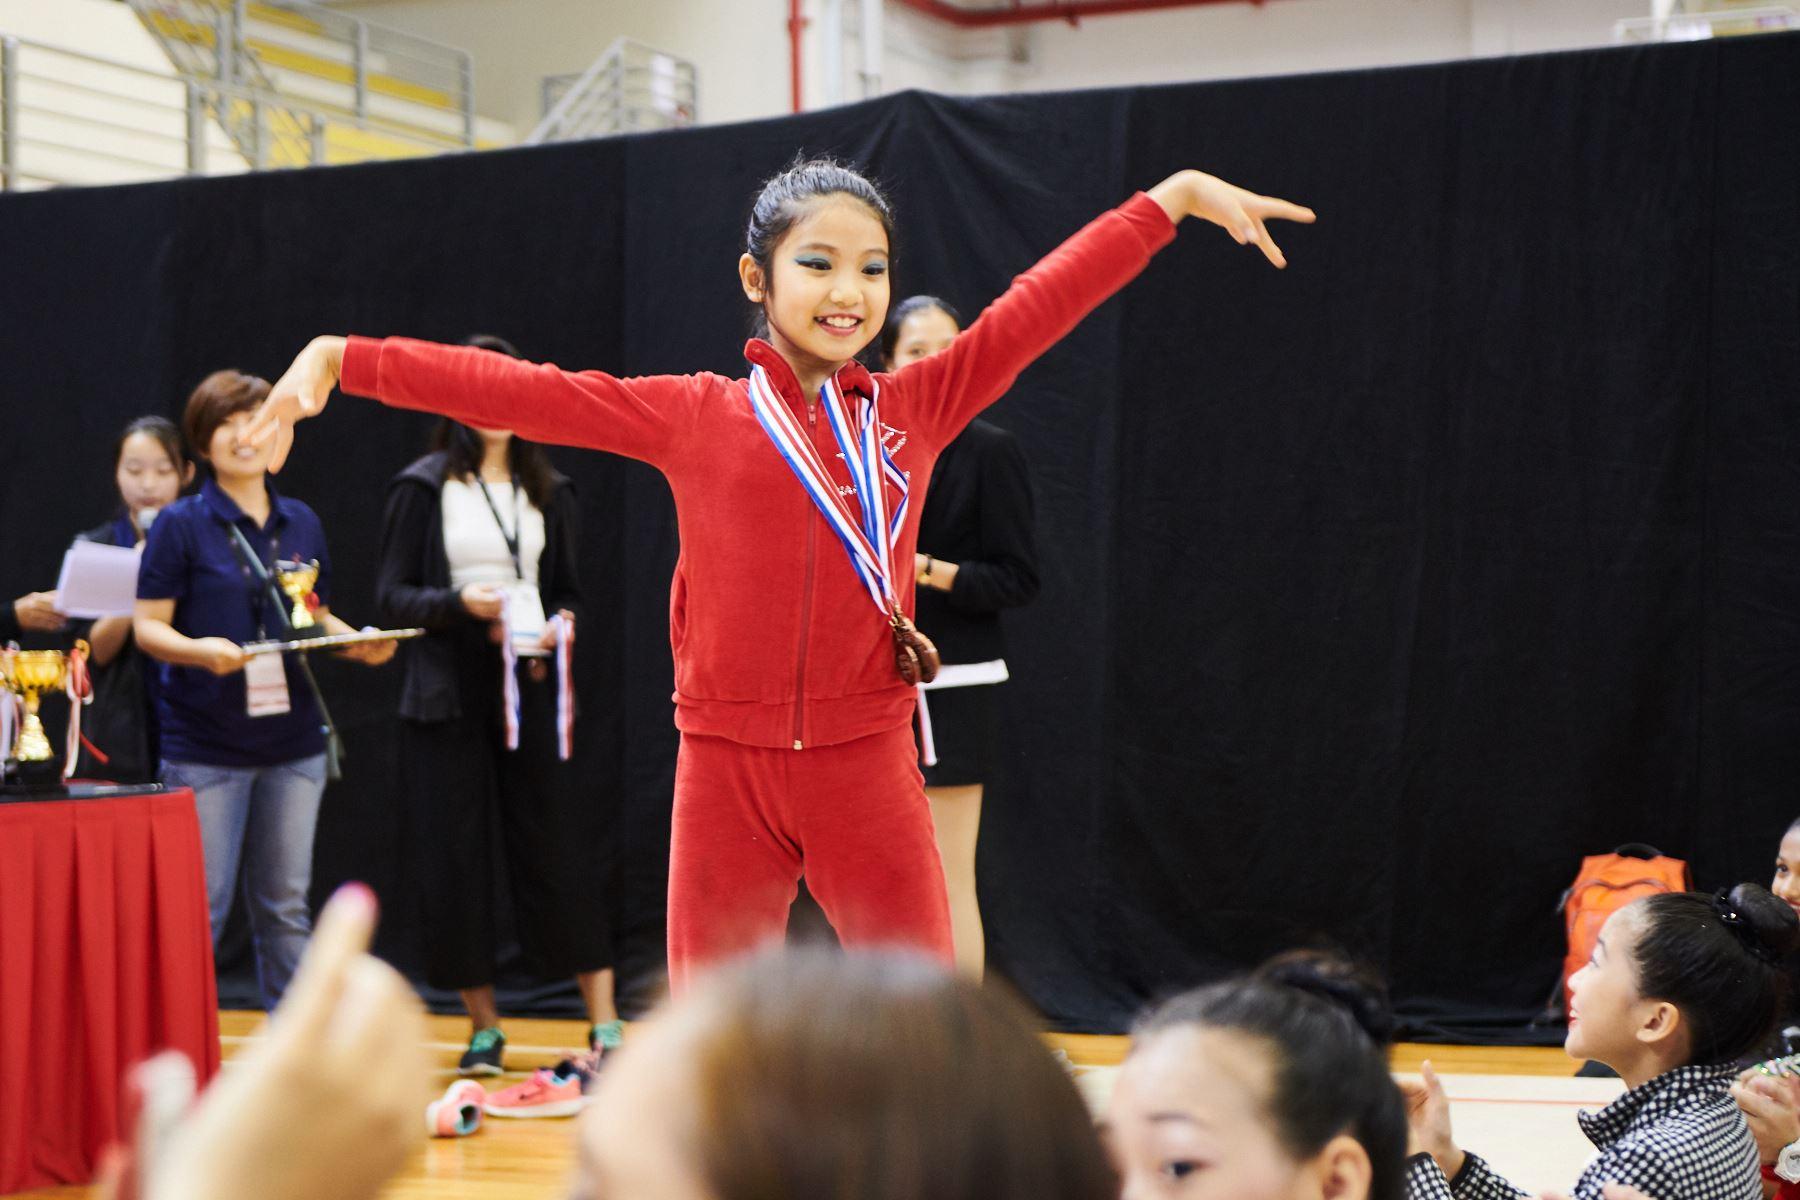 Singapore Gymnastics Open Championships 2018 11